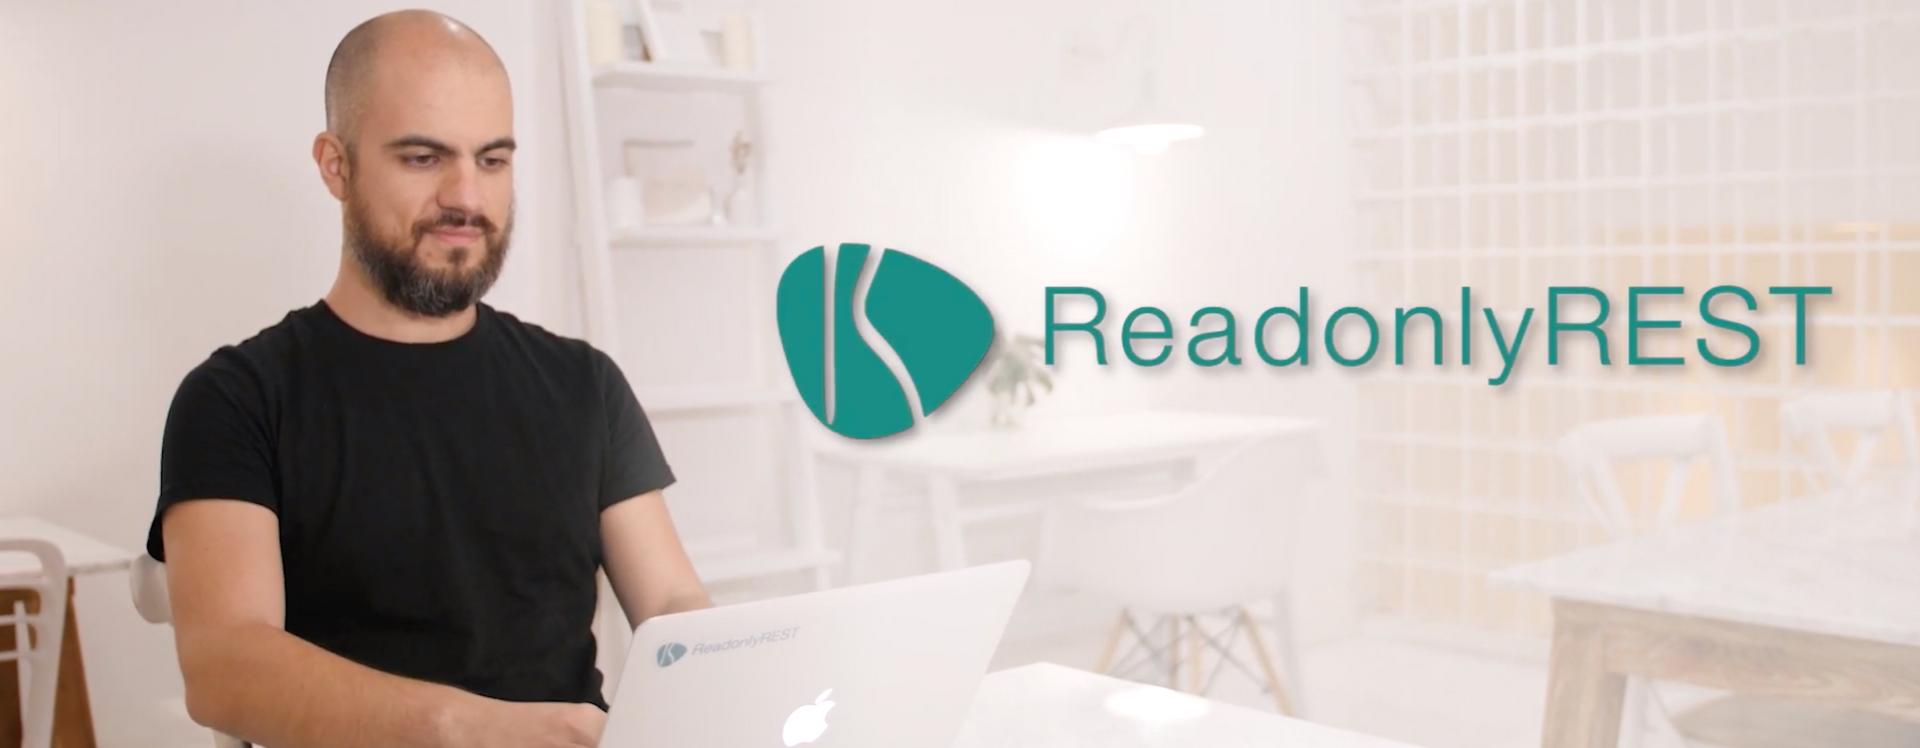 About ReadonlyREST